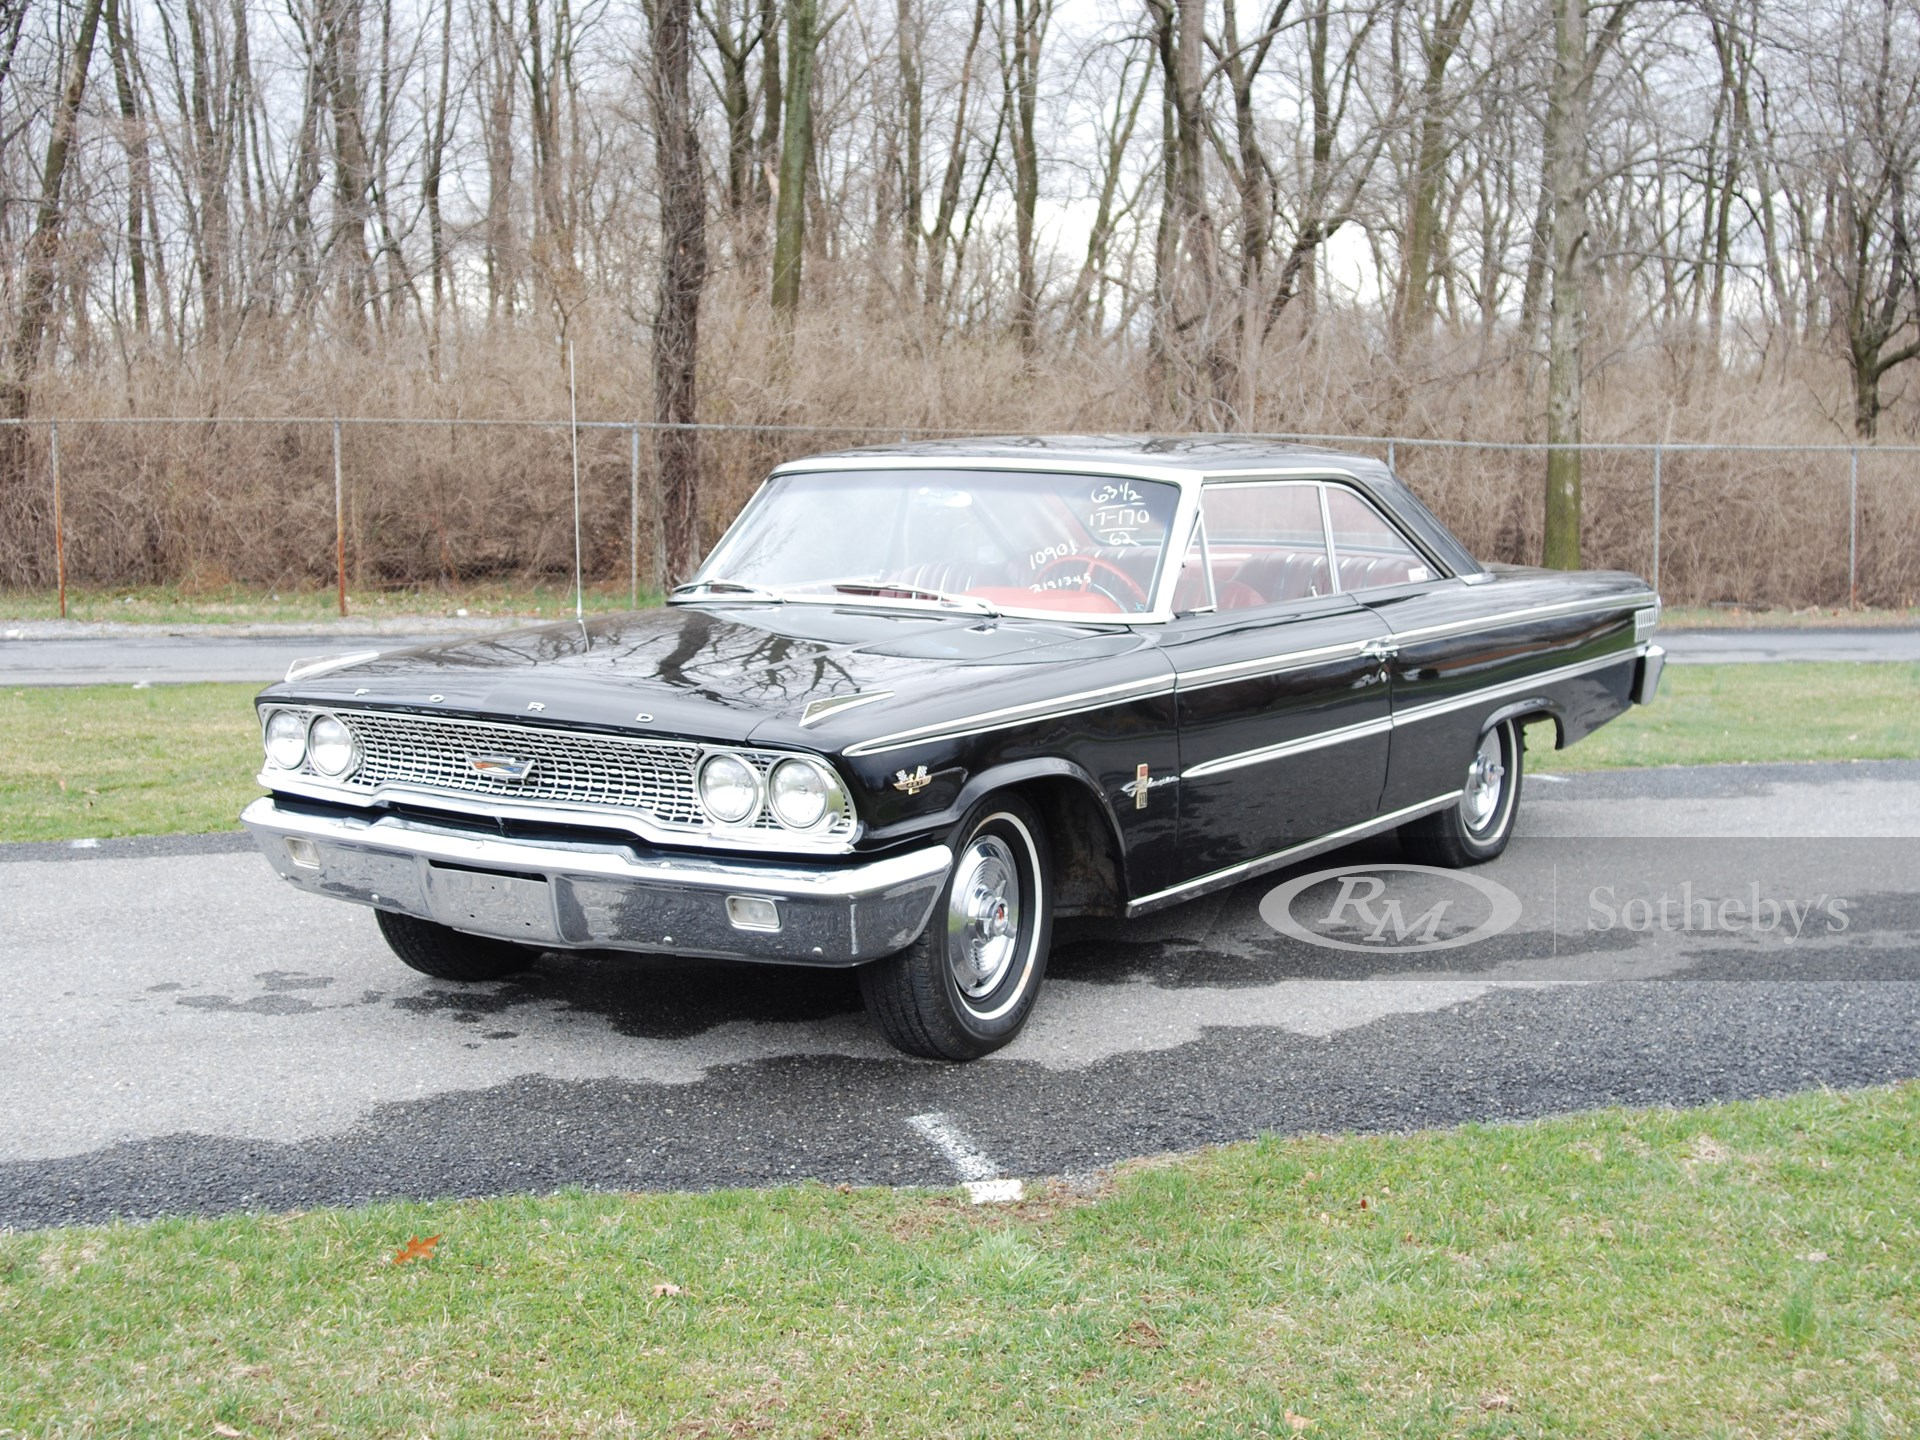 1963 1/2 Ford Galaxie 500 XL